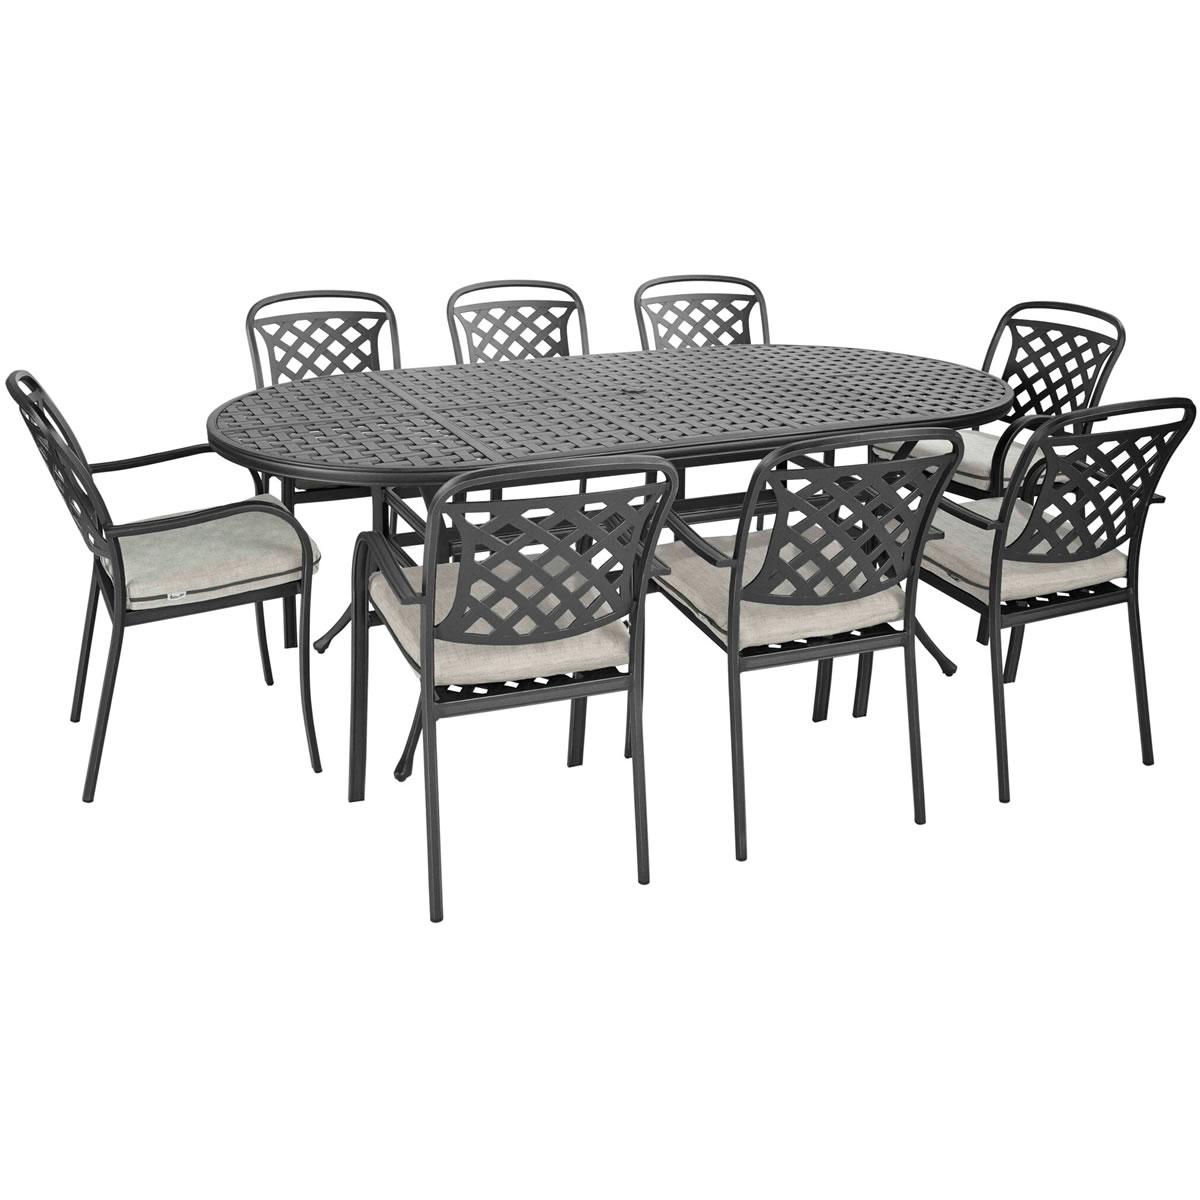 Aluminium Dining Chairs Uk Amalfi Cast Aluminium Garden Dining